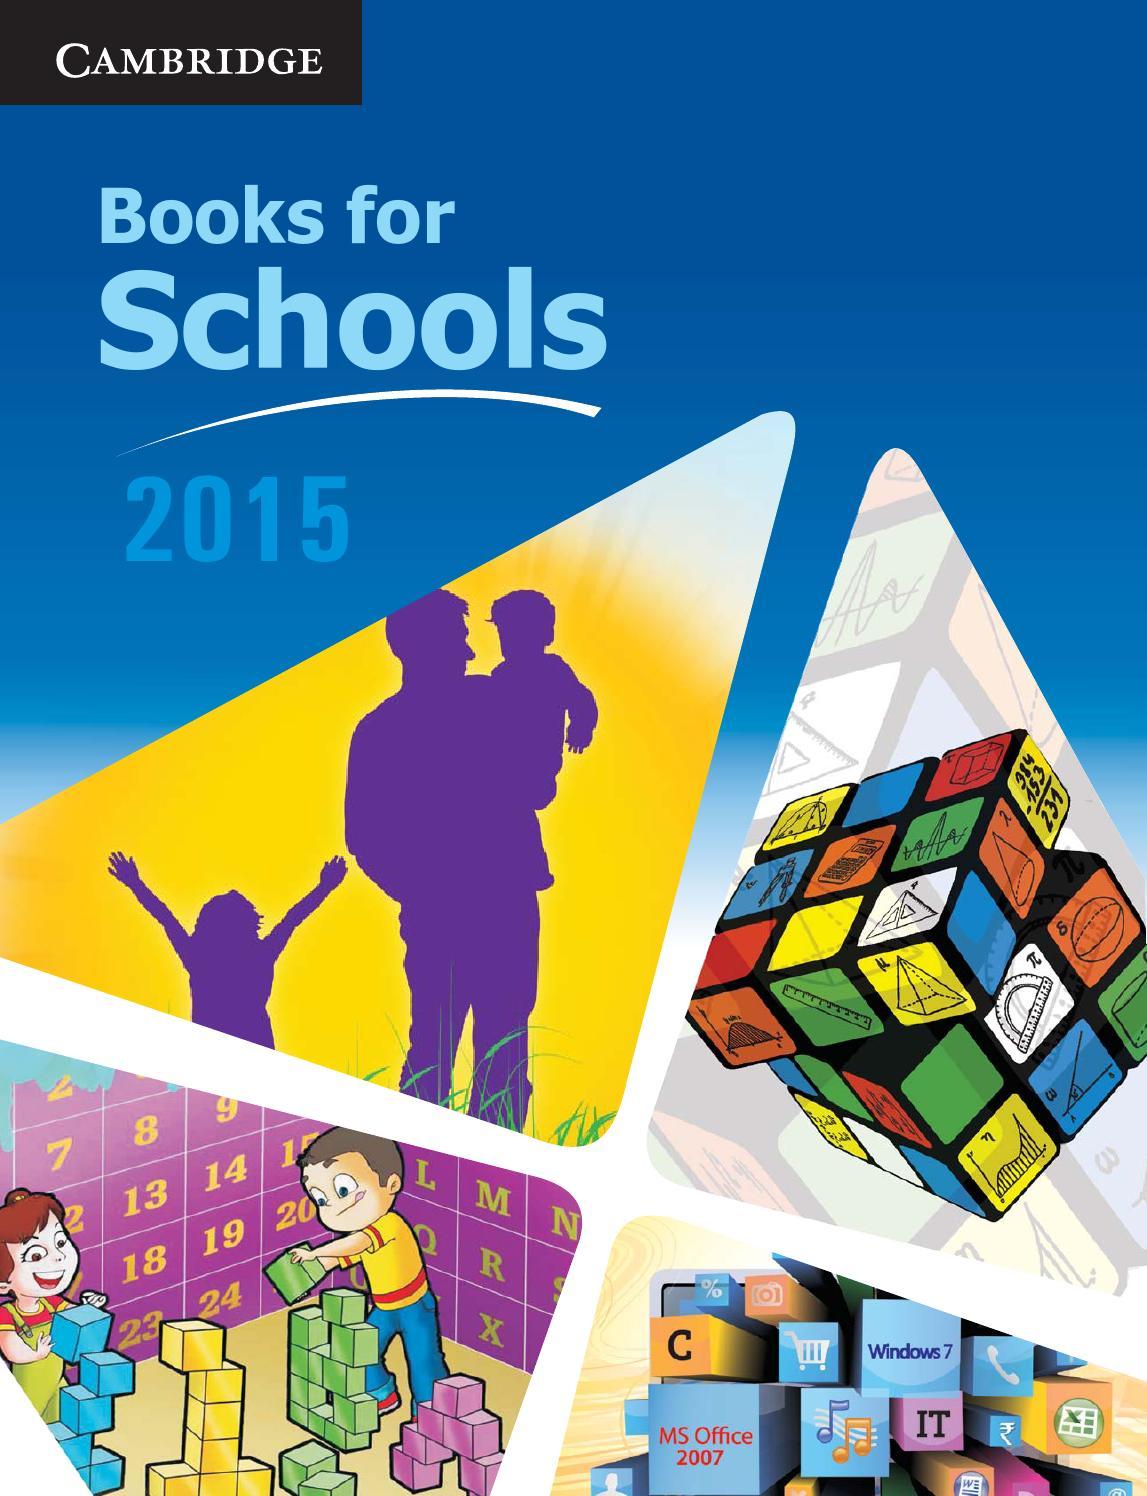 School books 2015 by Cambridge India - issuu